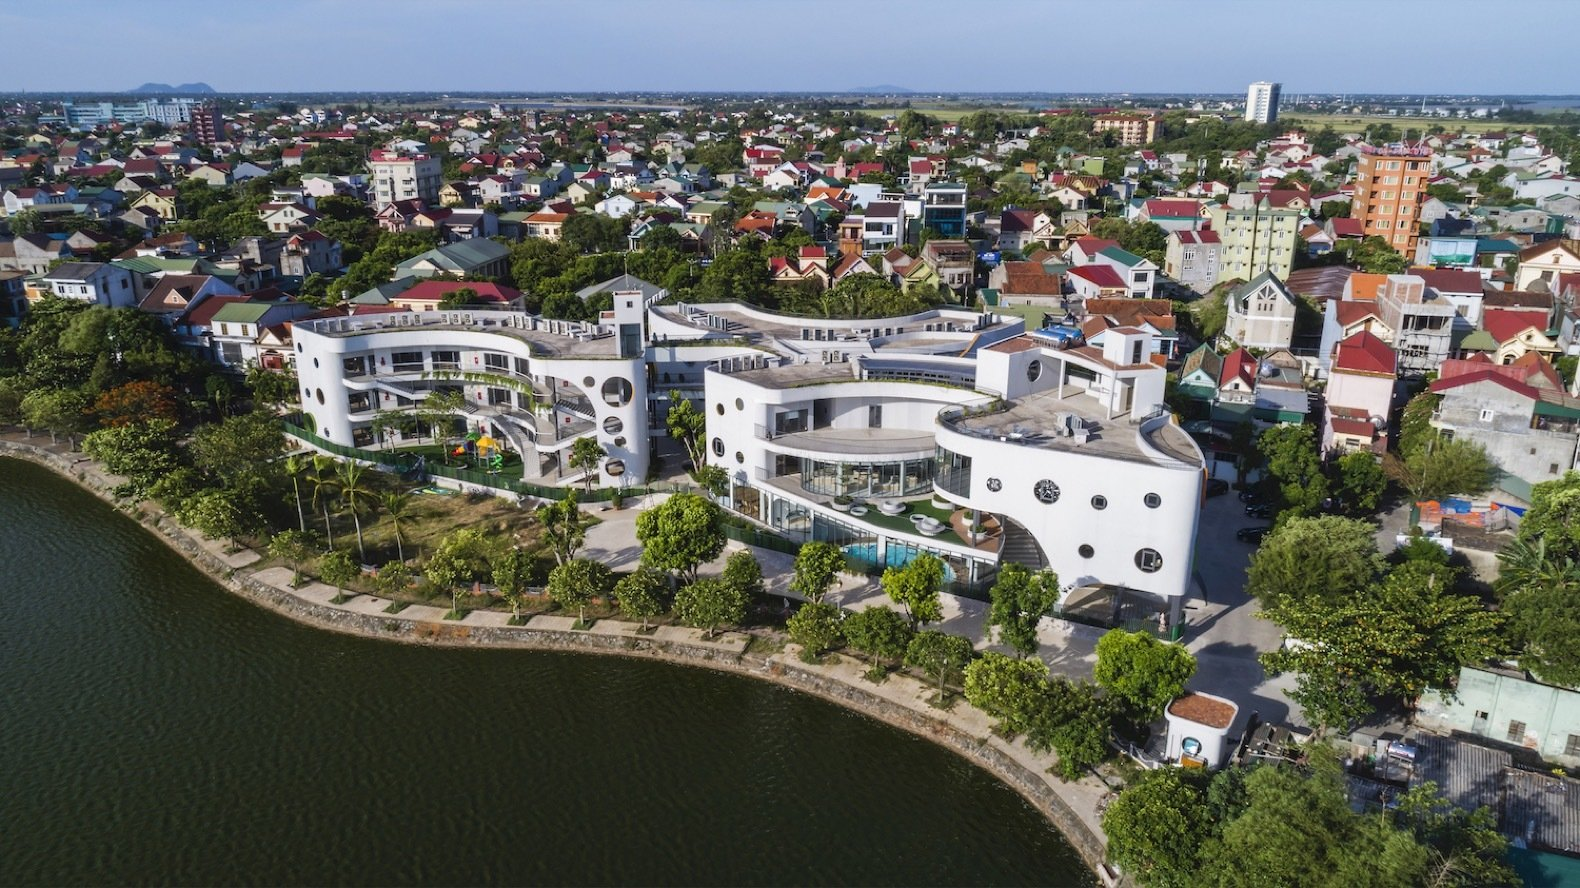 Eco Kindi aerial view